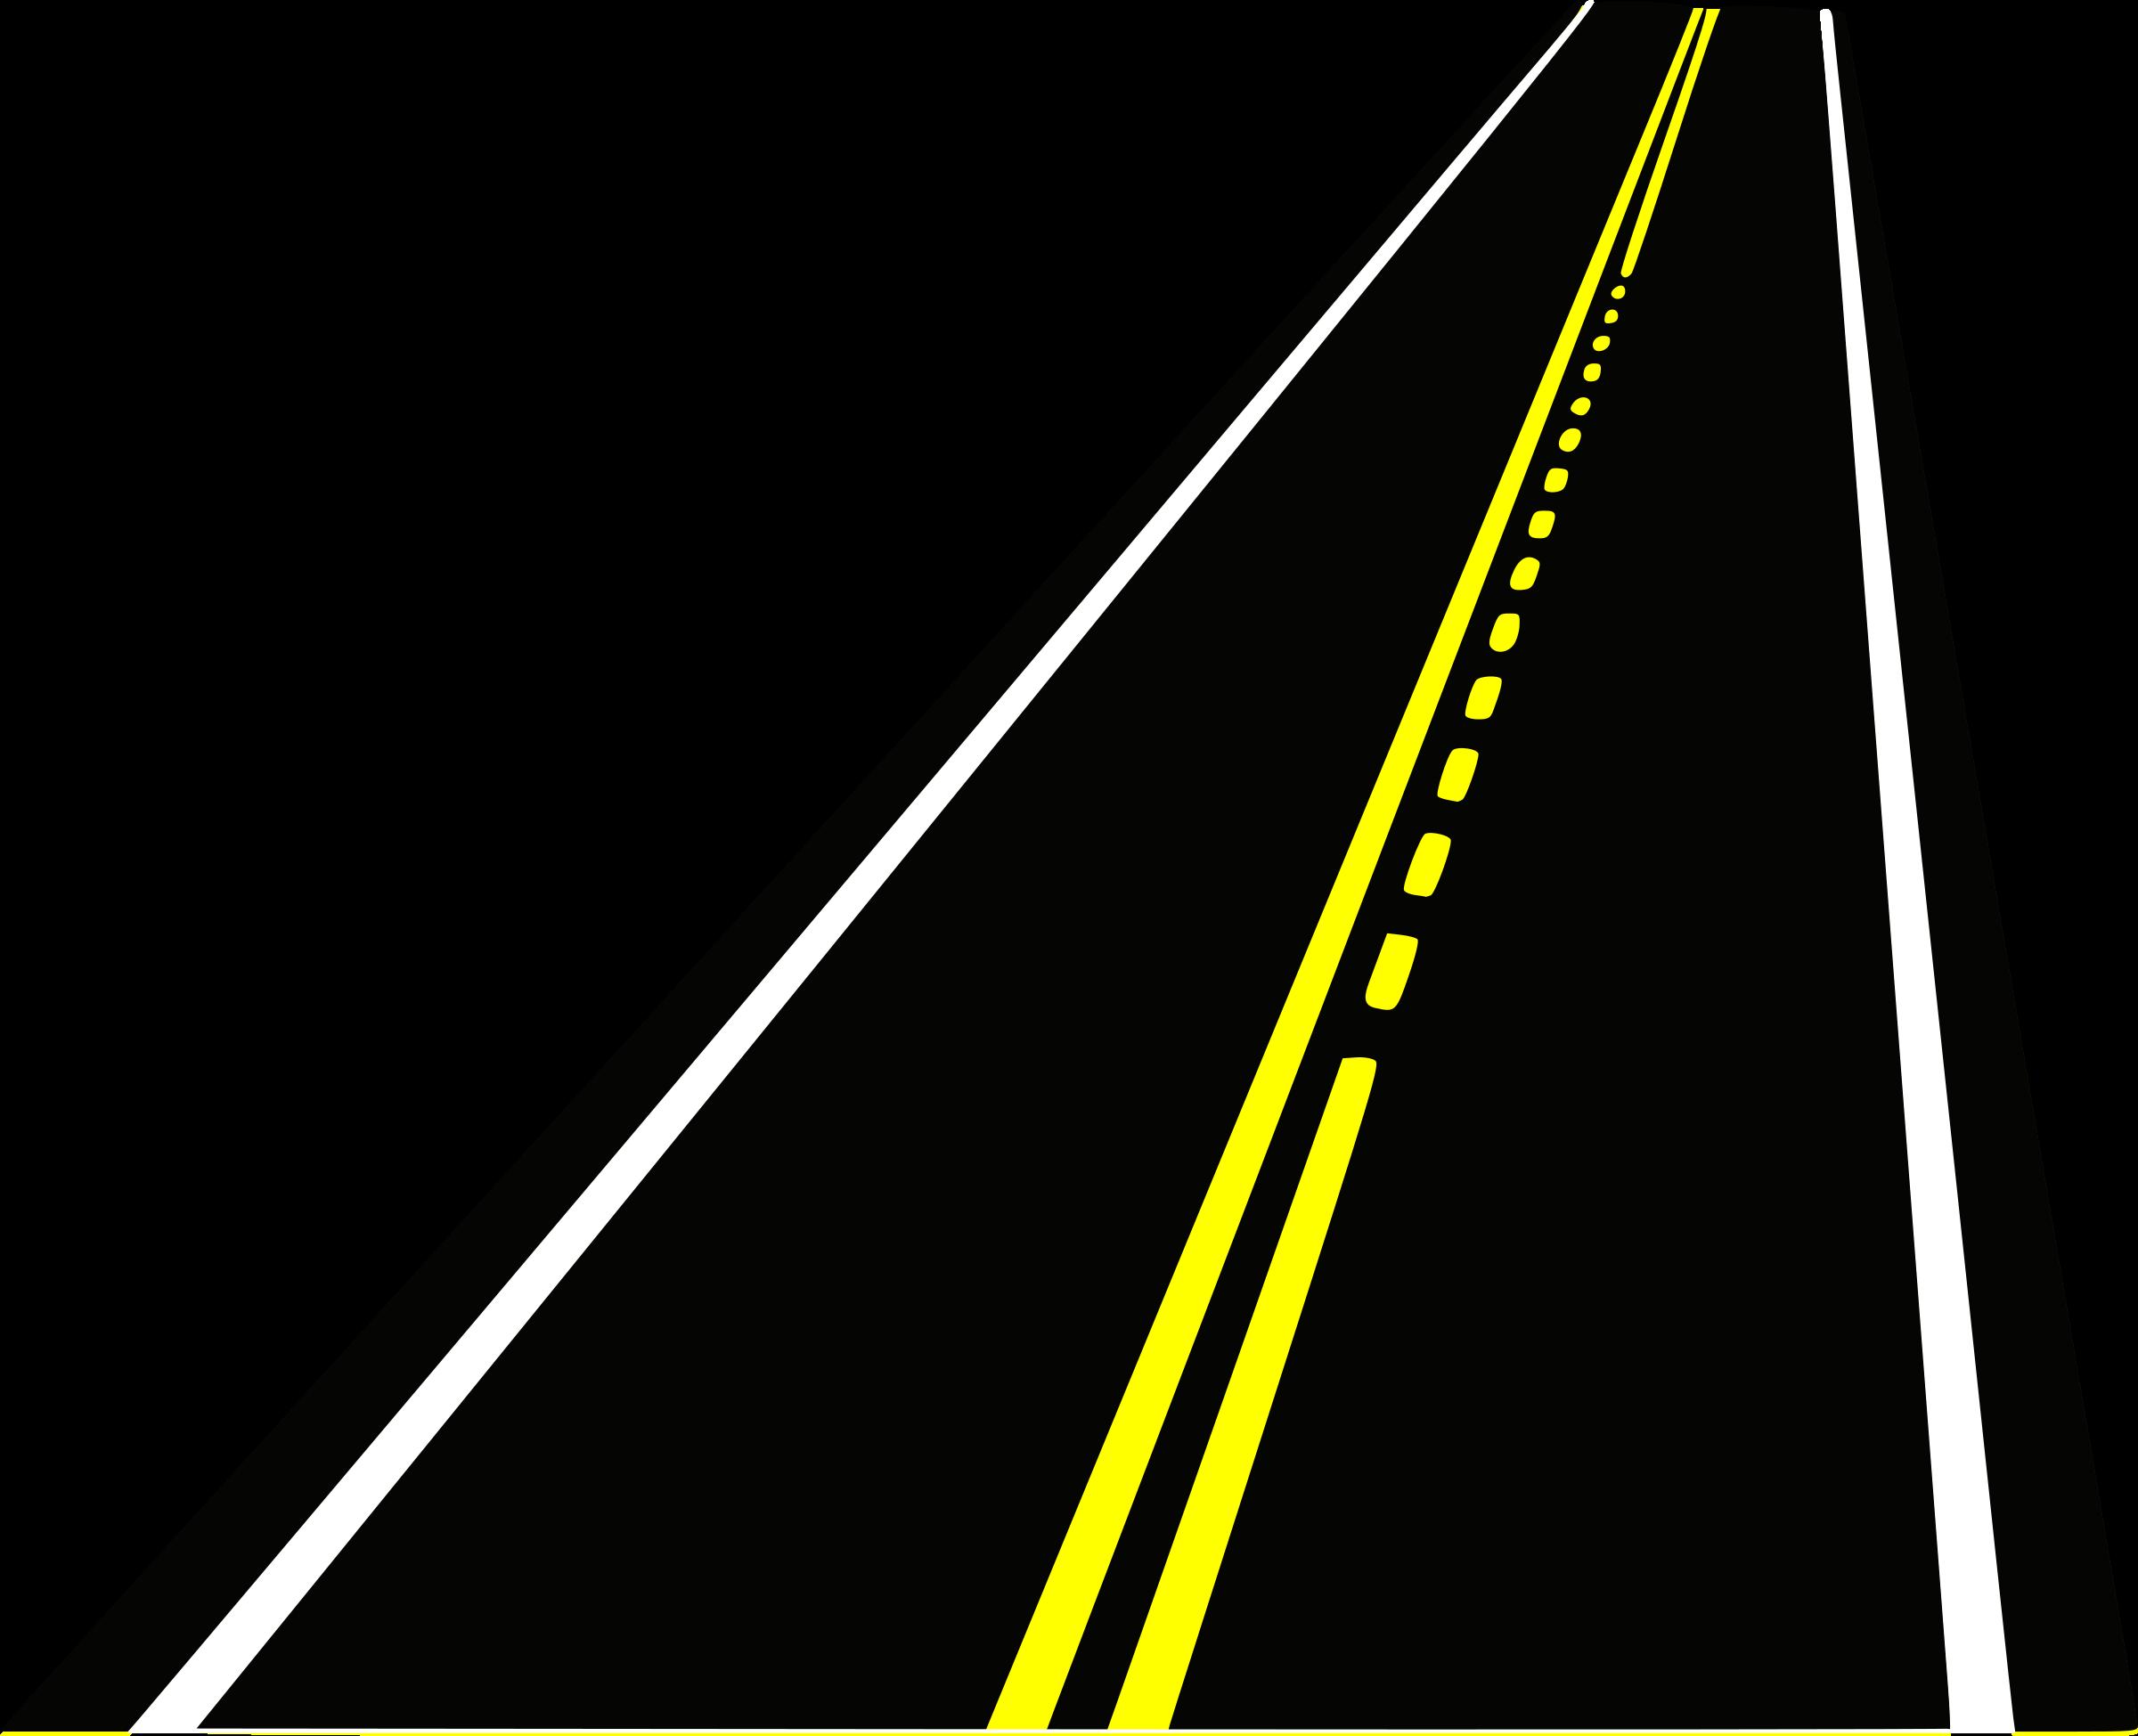 Clipart road straight road, Clipart road straight road.